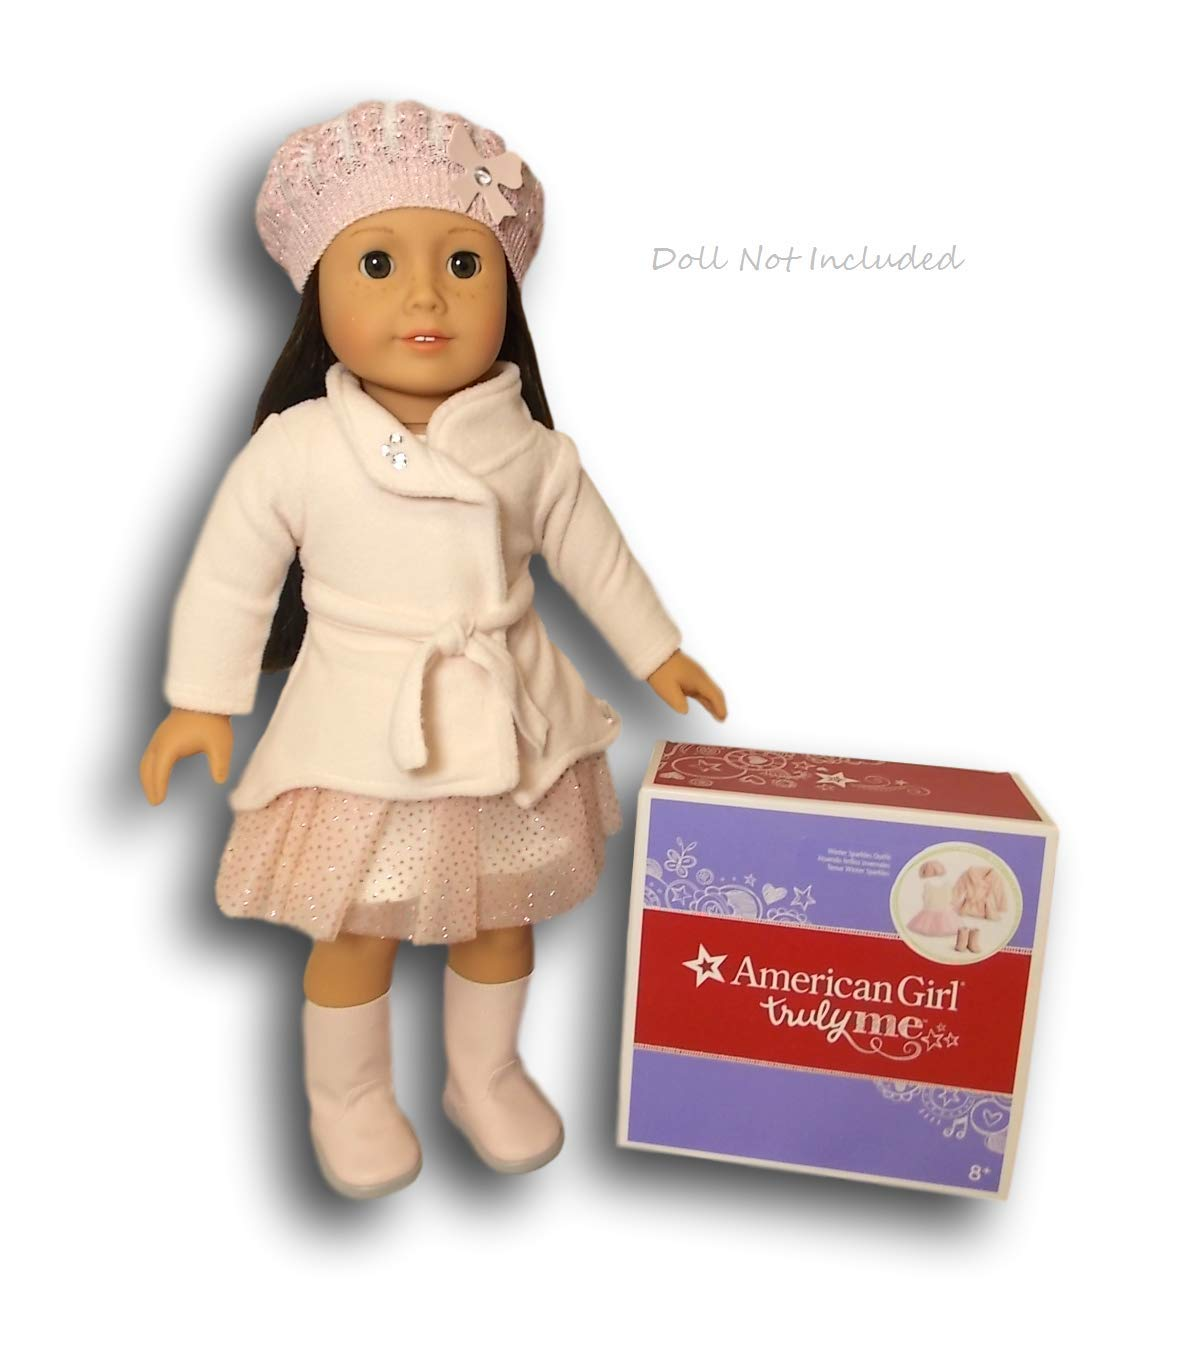 American Girl Truly Me Winter Sparkles 套装,适合 18 英寸玩偶(不含玩偶)